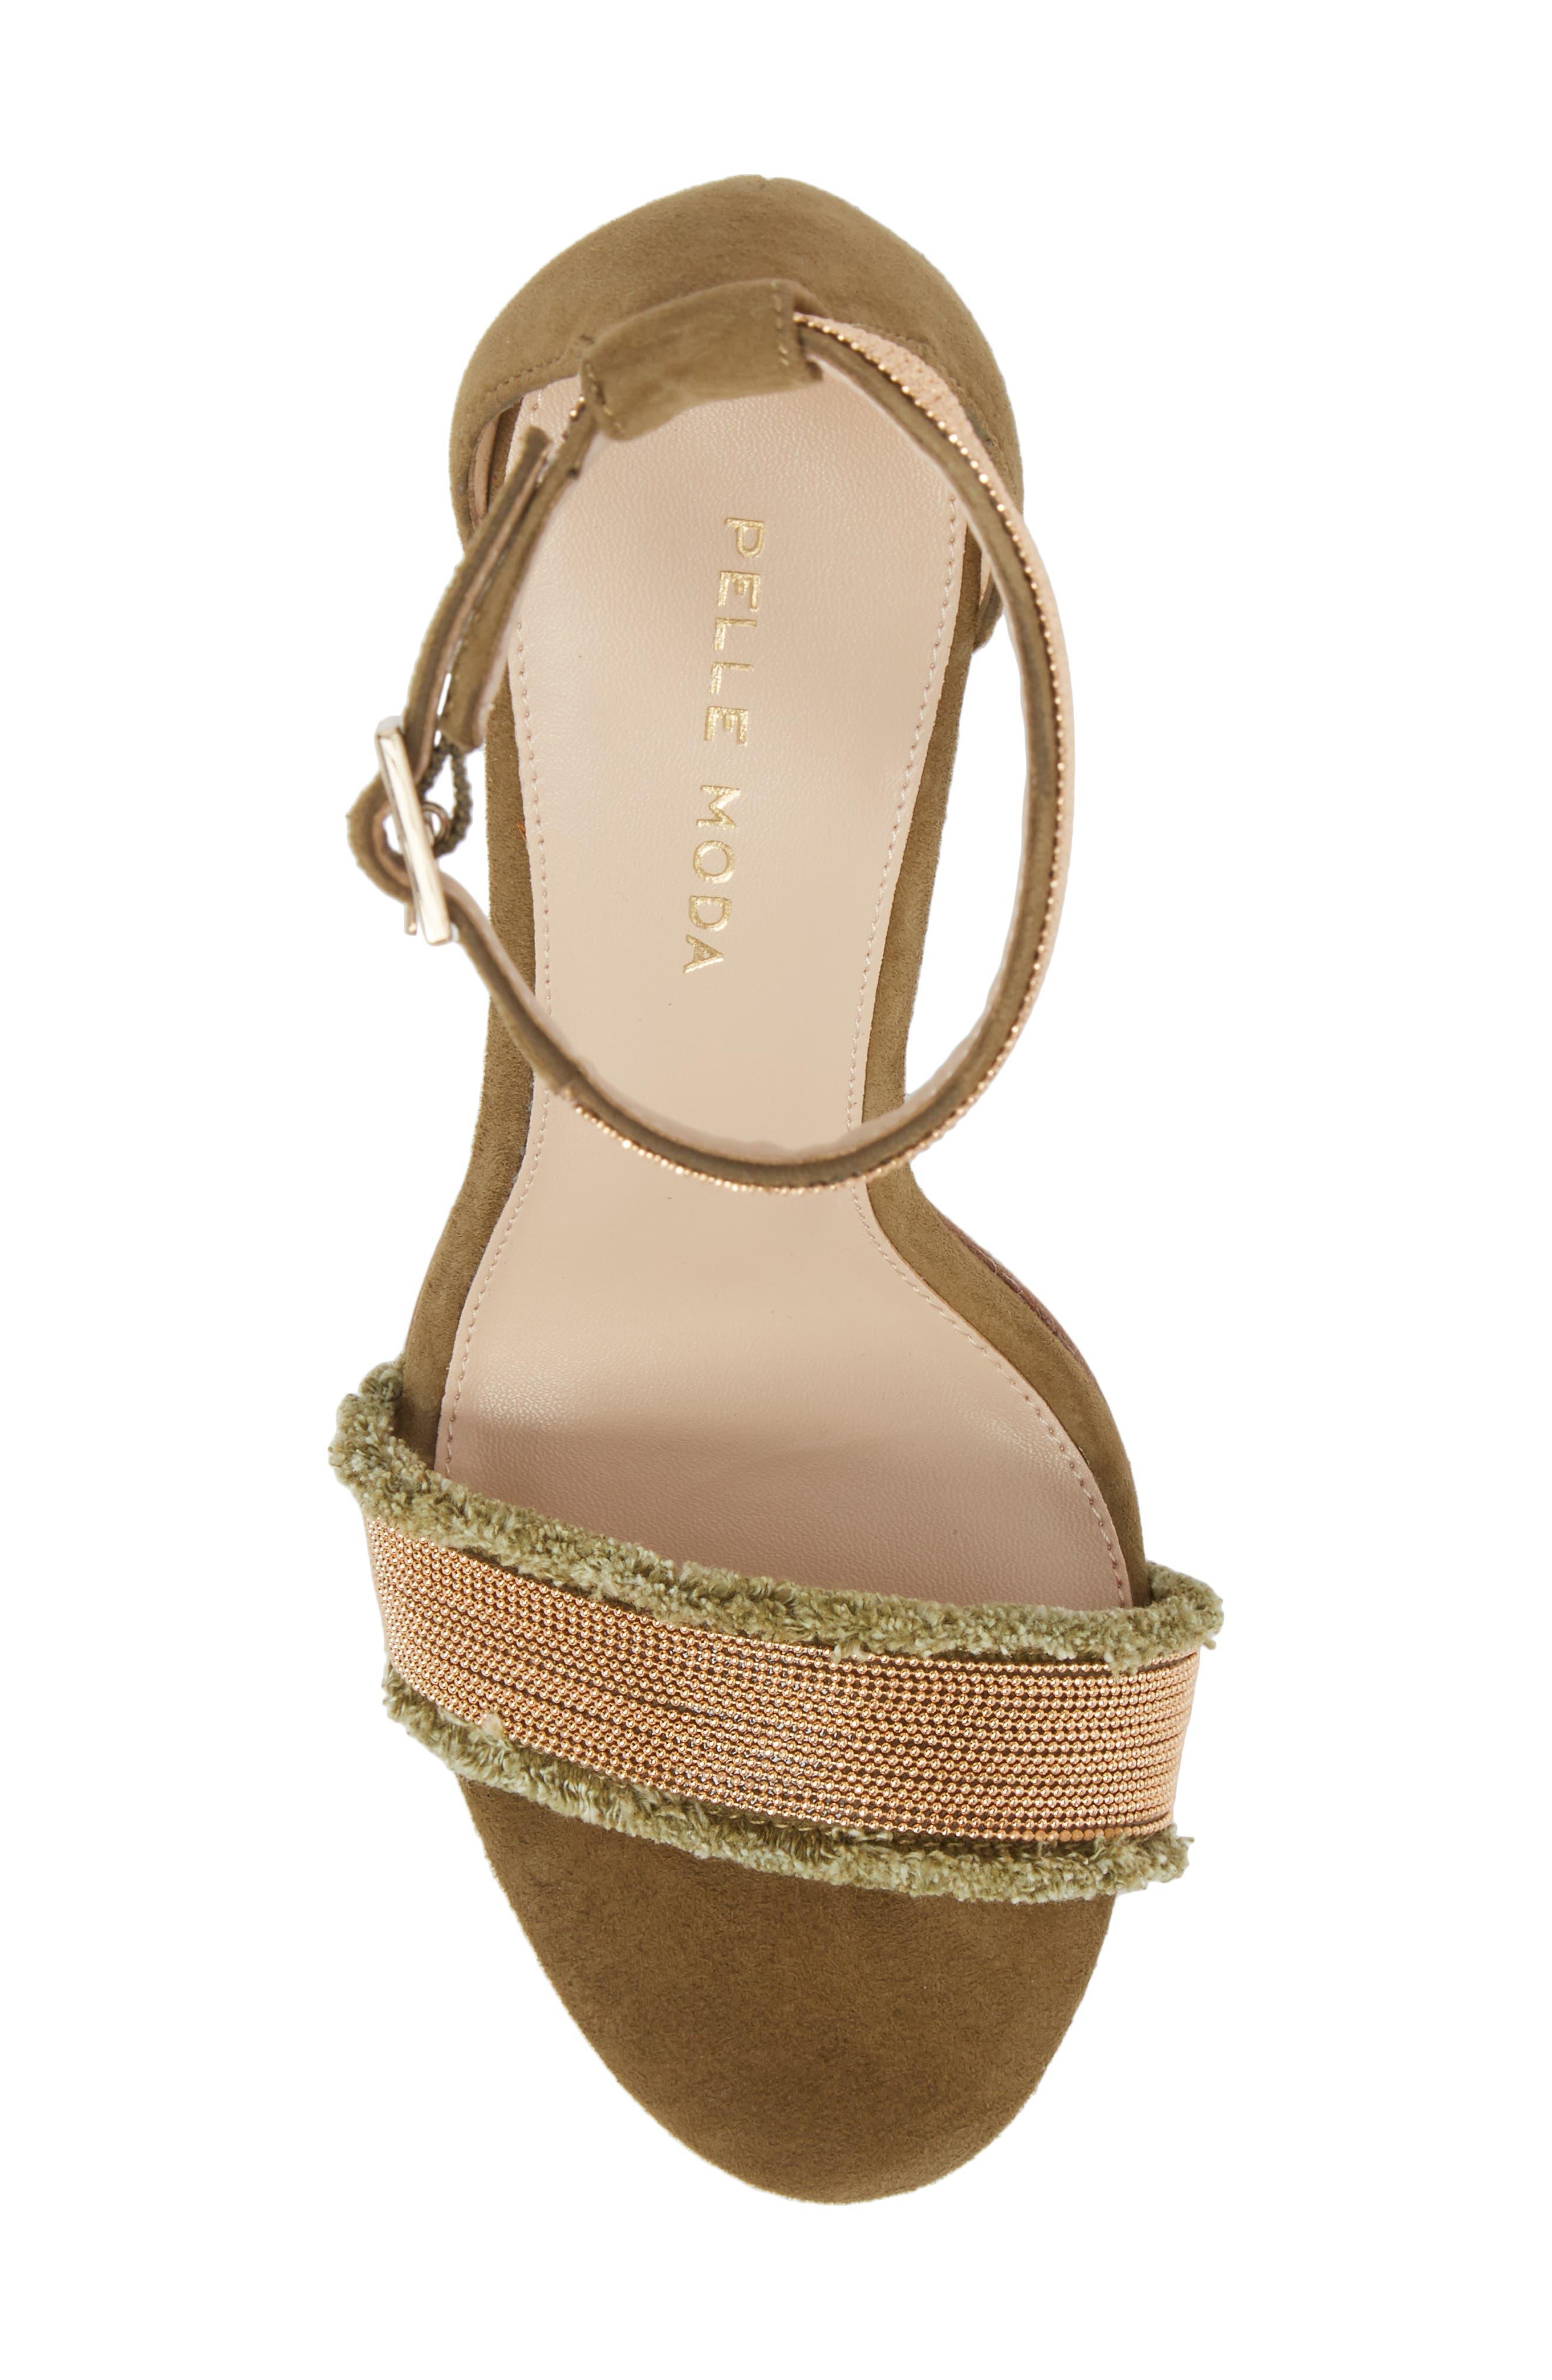 Bonnie6 Embellished Sandal,                             Alternate thumbnail 5, color,                             KHAKI SUEDE